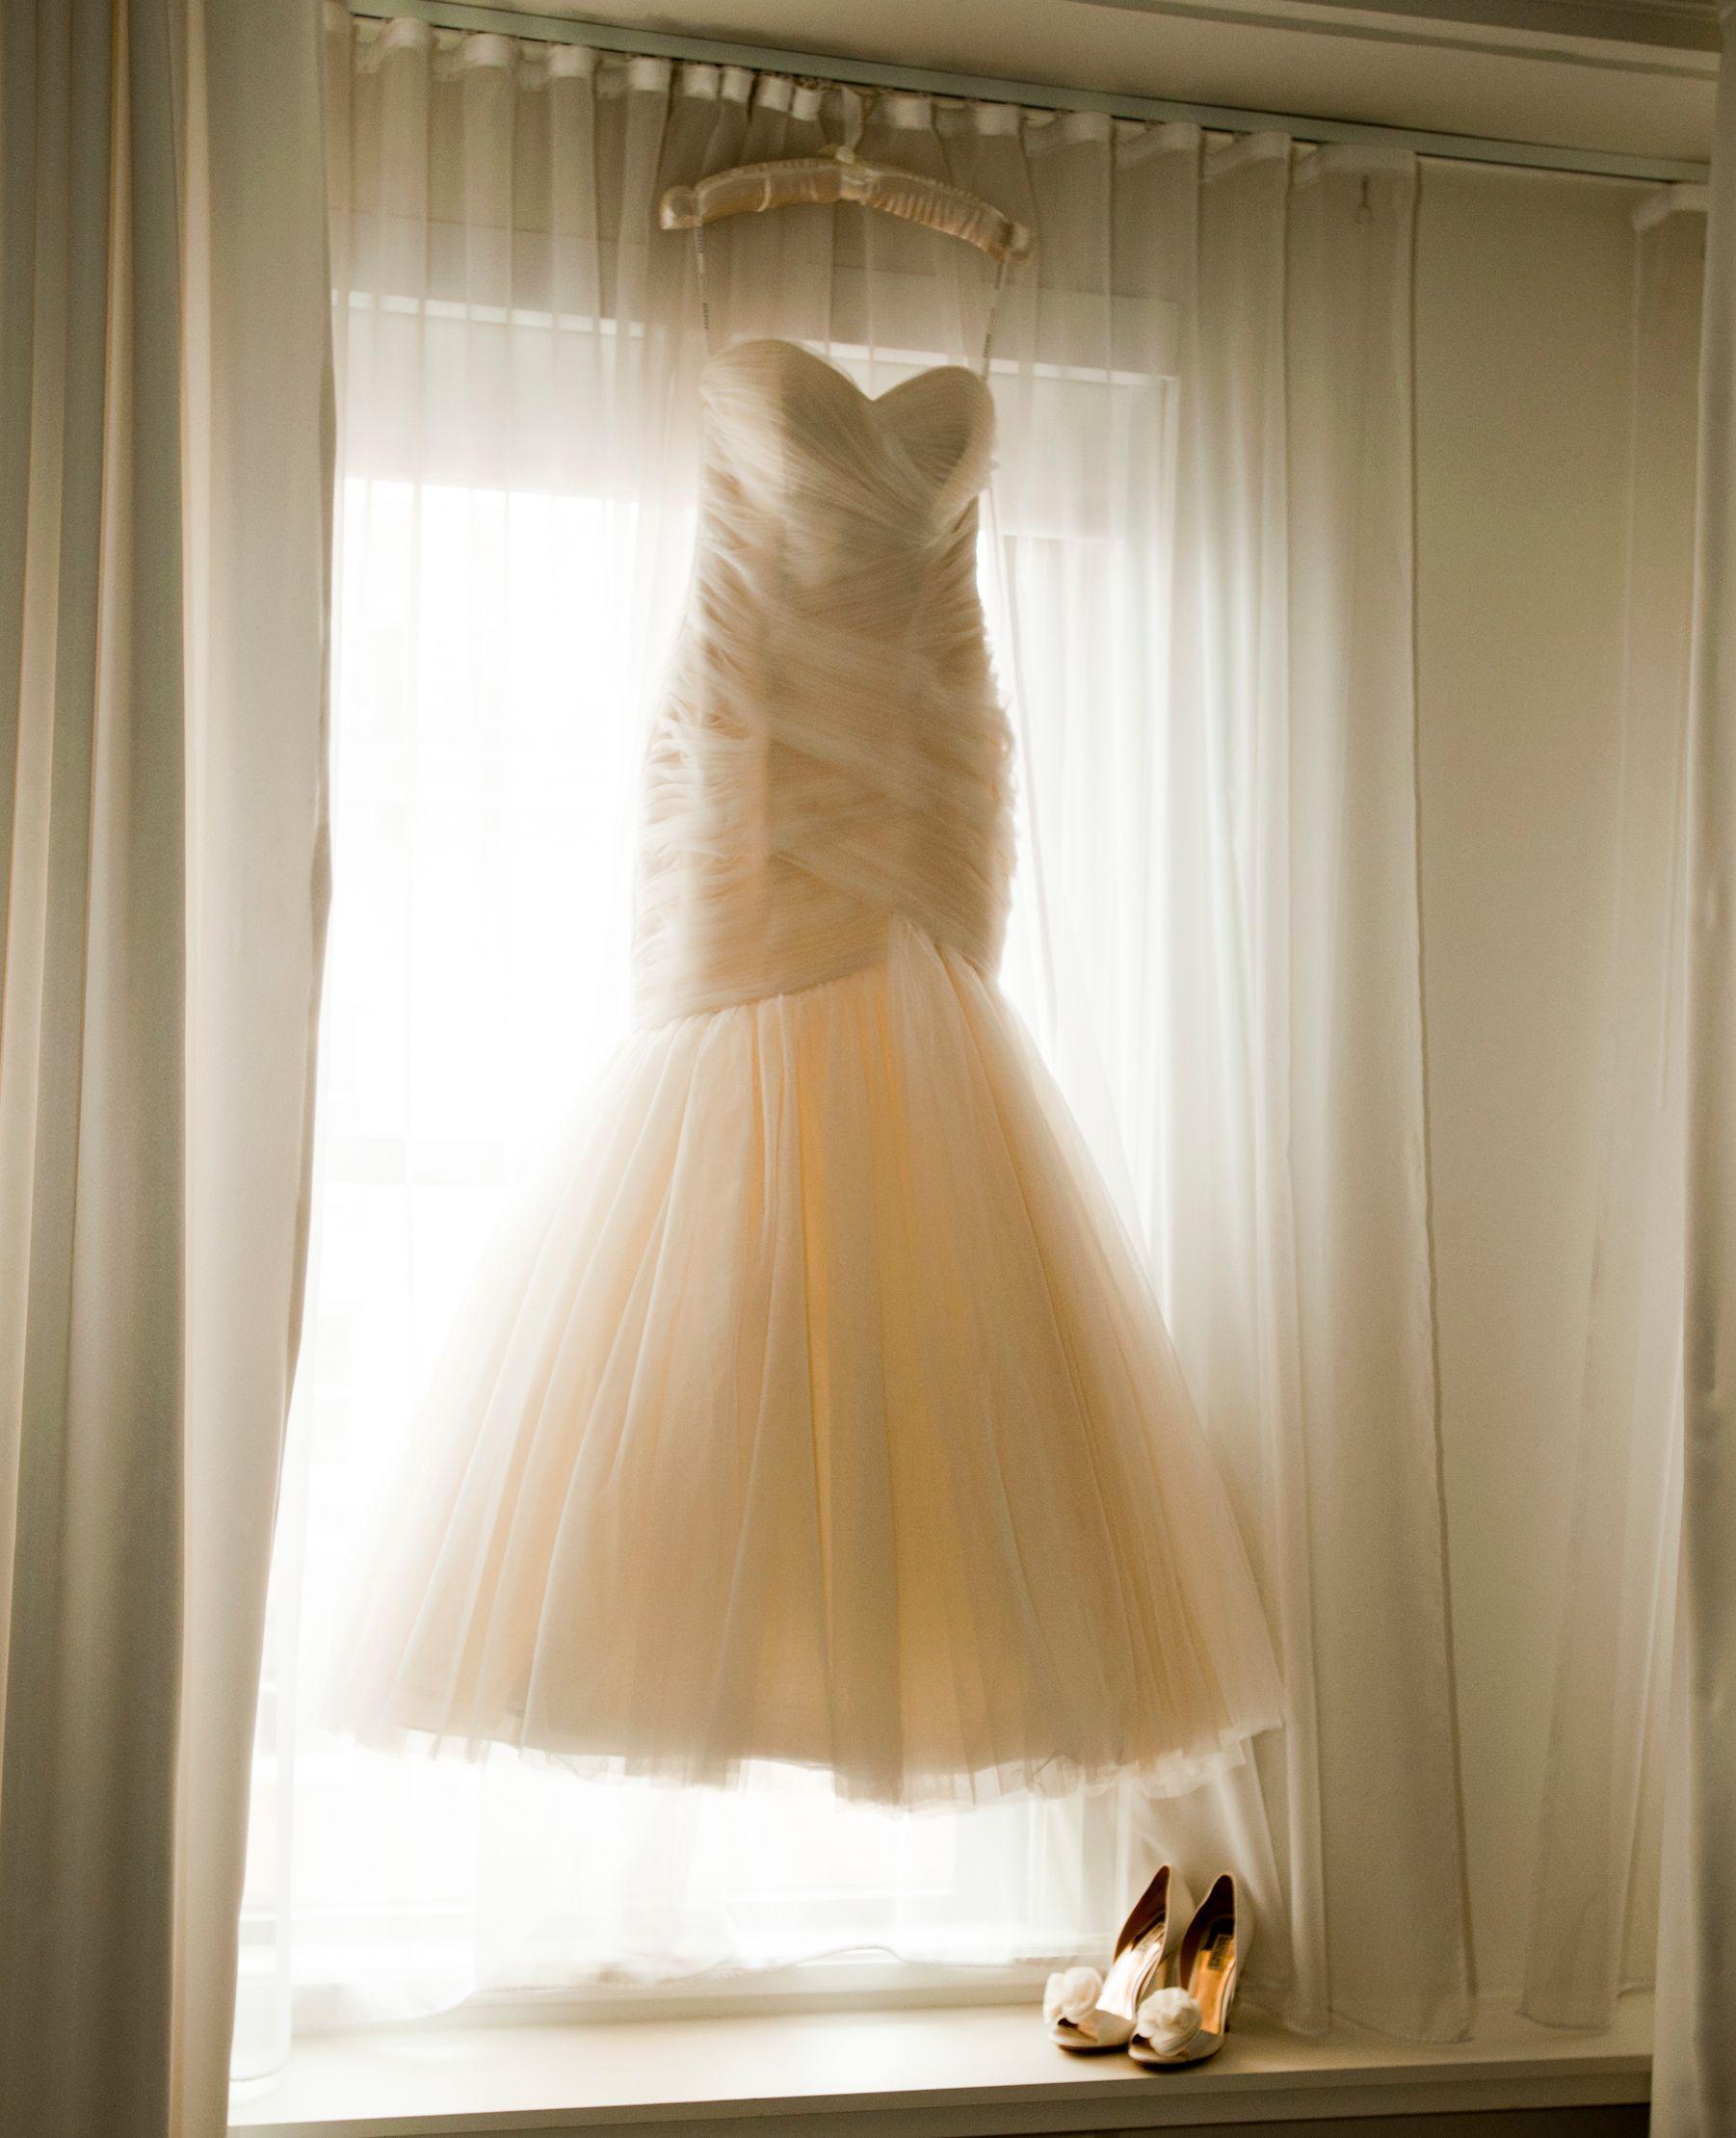 1r20140823_mwpf_megan_and_jordan_s_wedding_perspective_1_7123.jpg